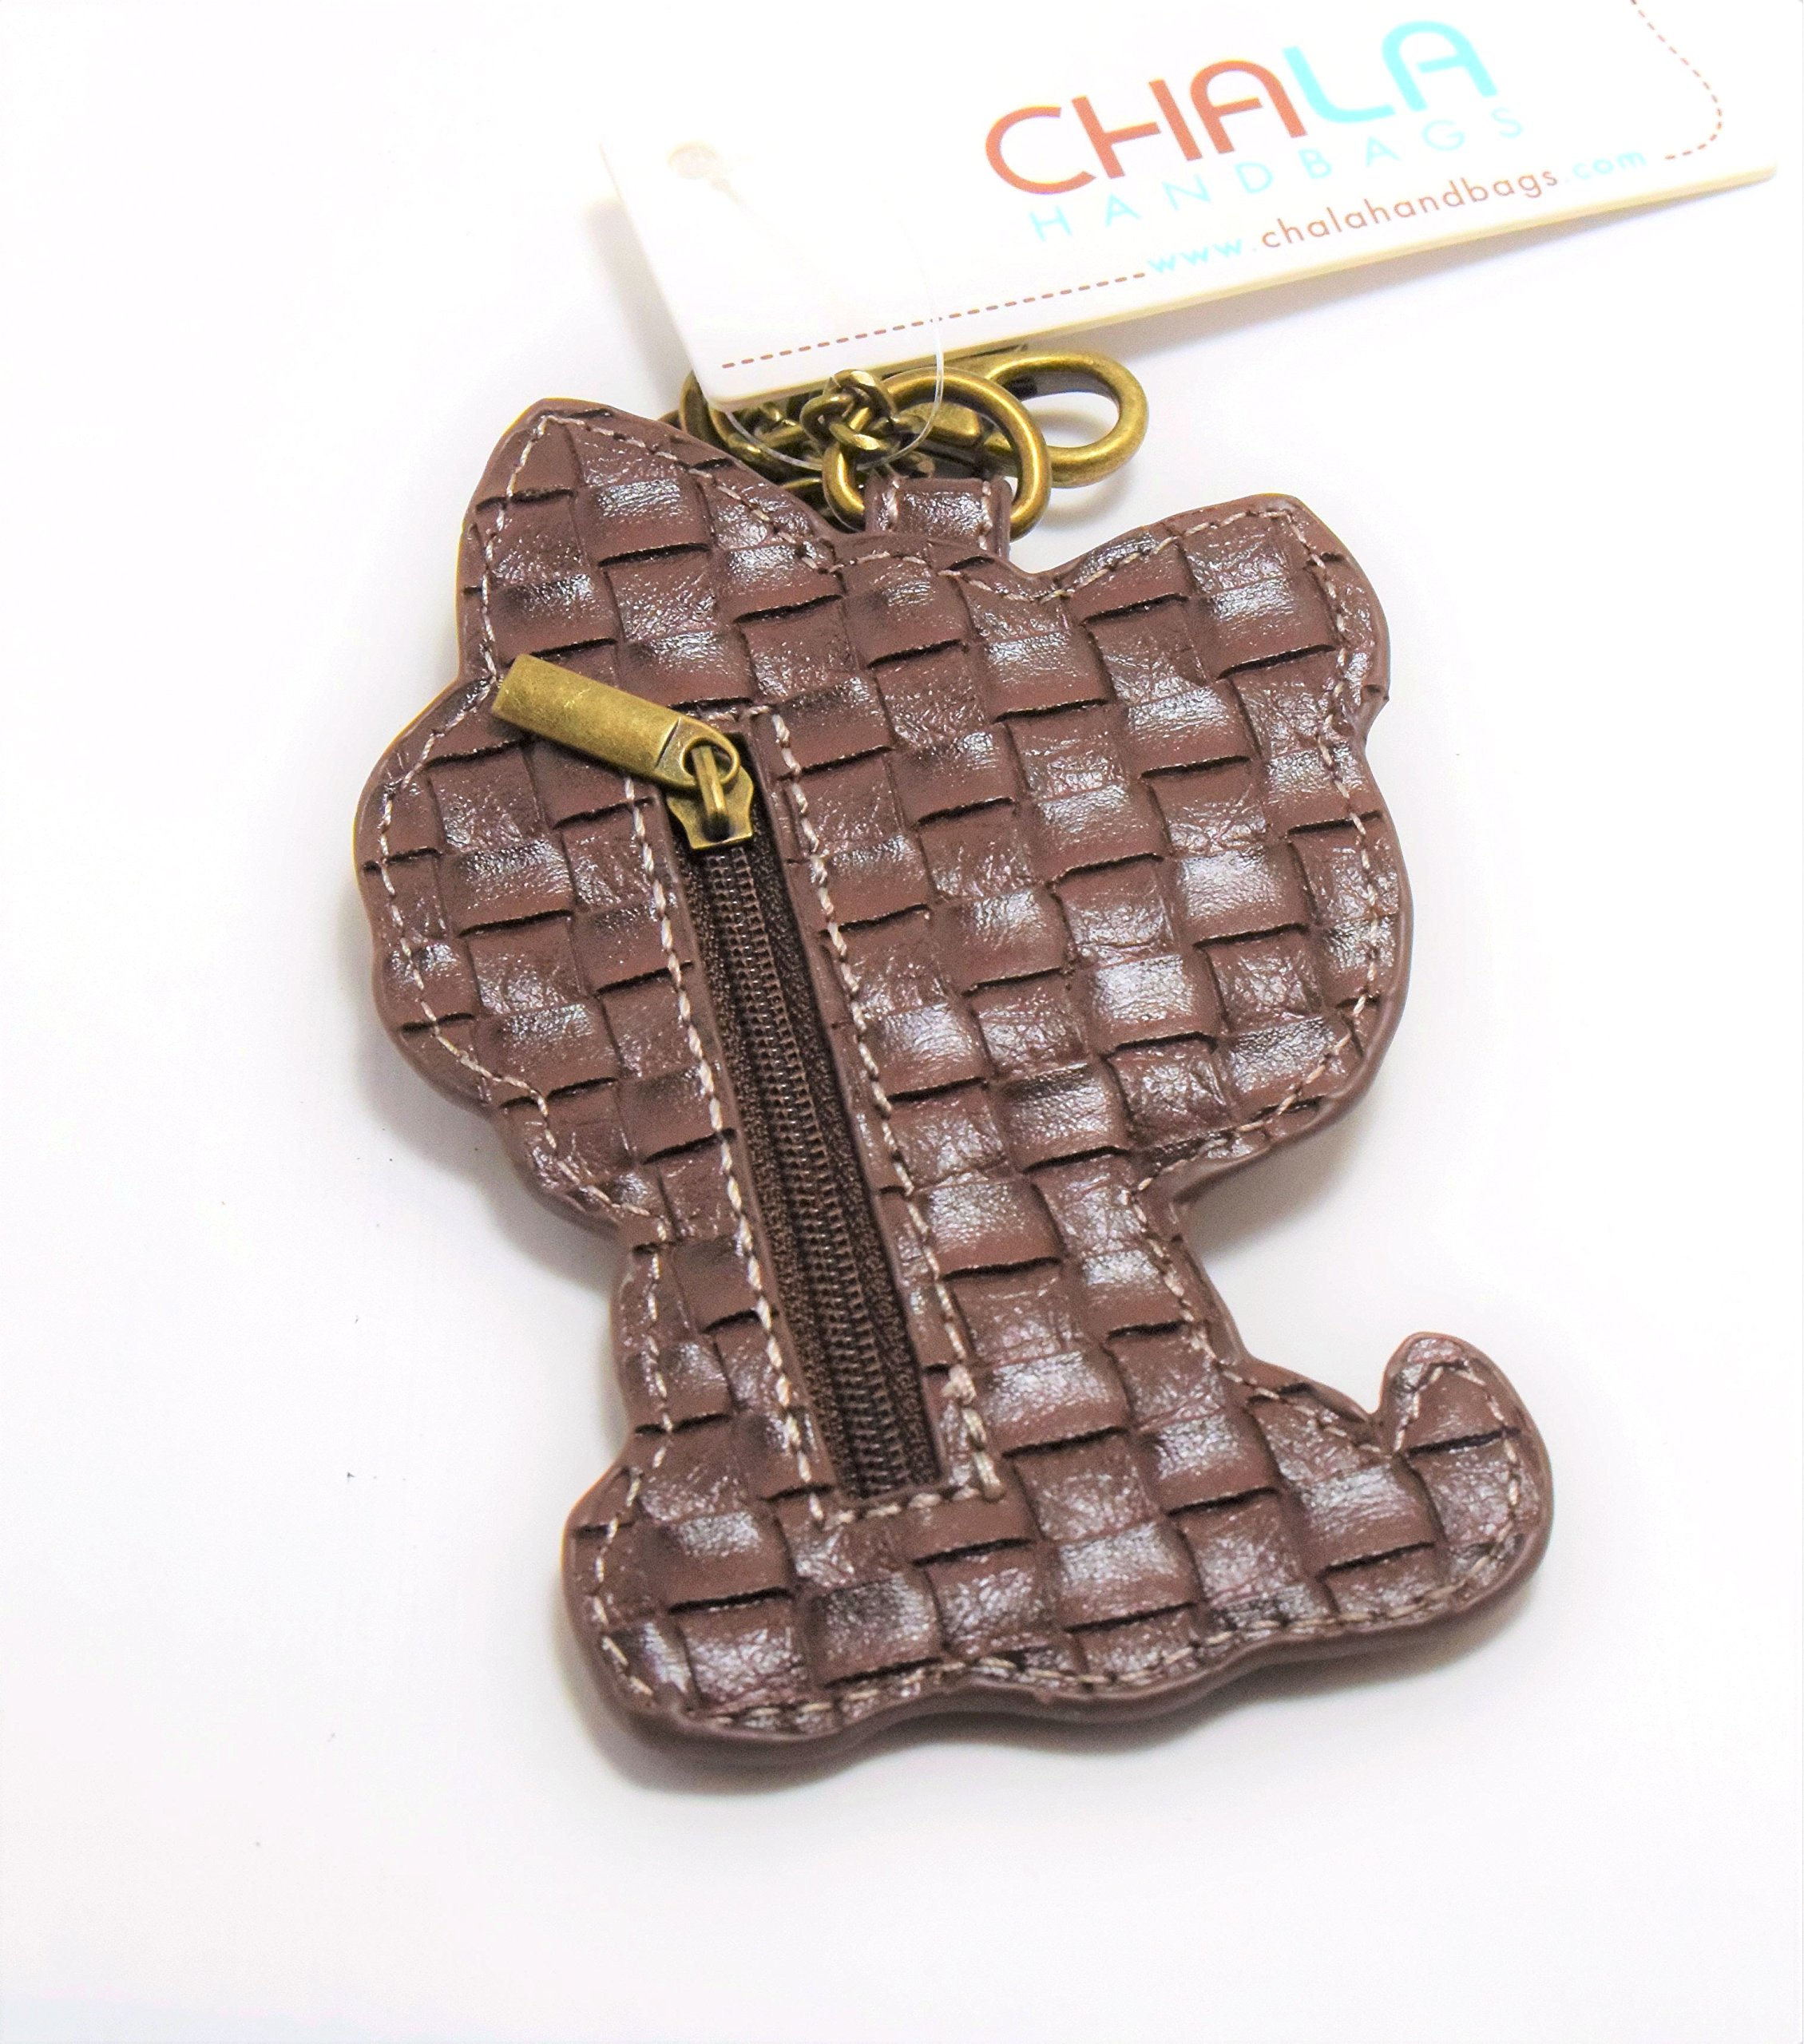 Chala Pal Bag Charm/ Key-Fob/ Coin Purse- Men's Best Friend Collection (Yorkie Terrier)